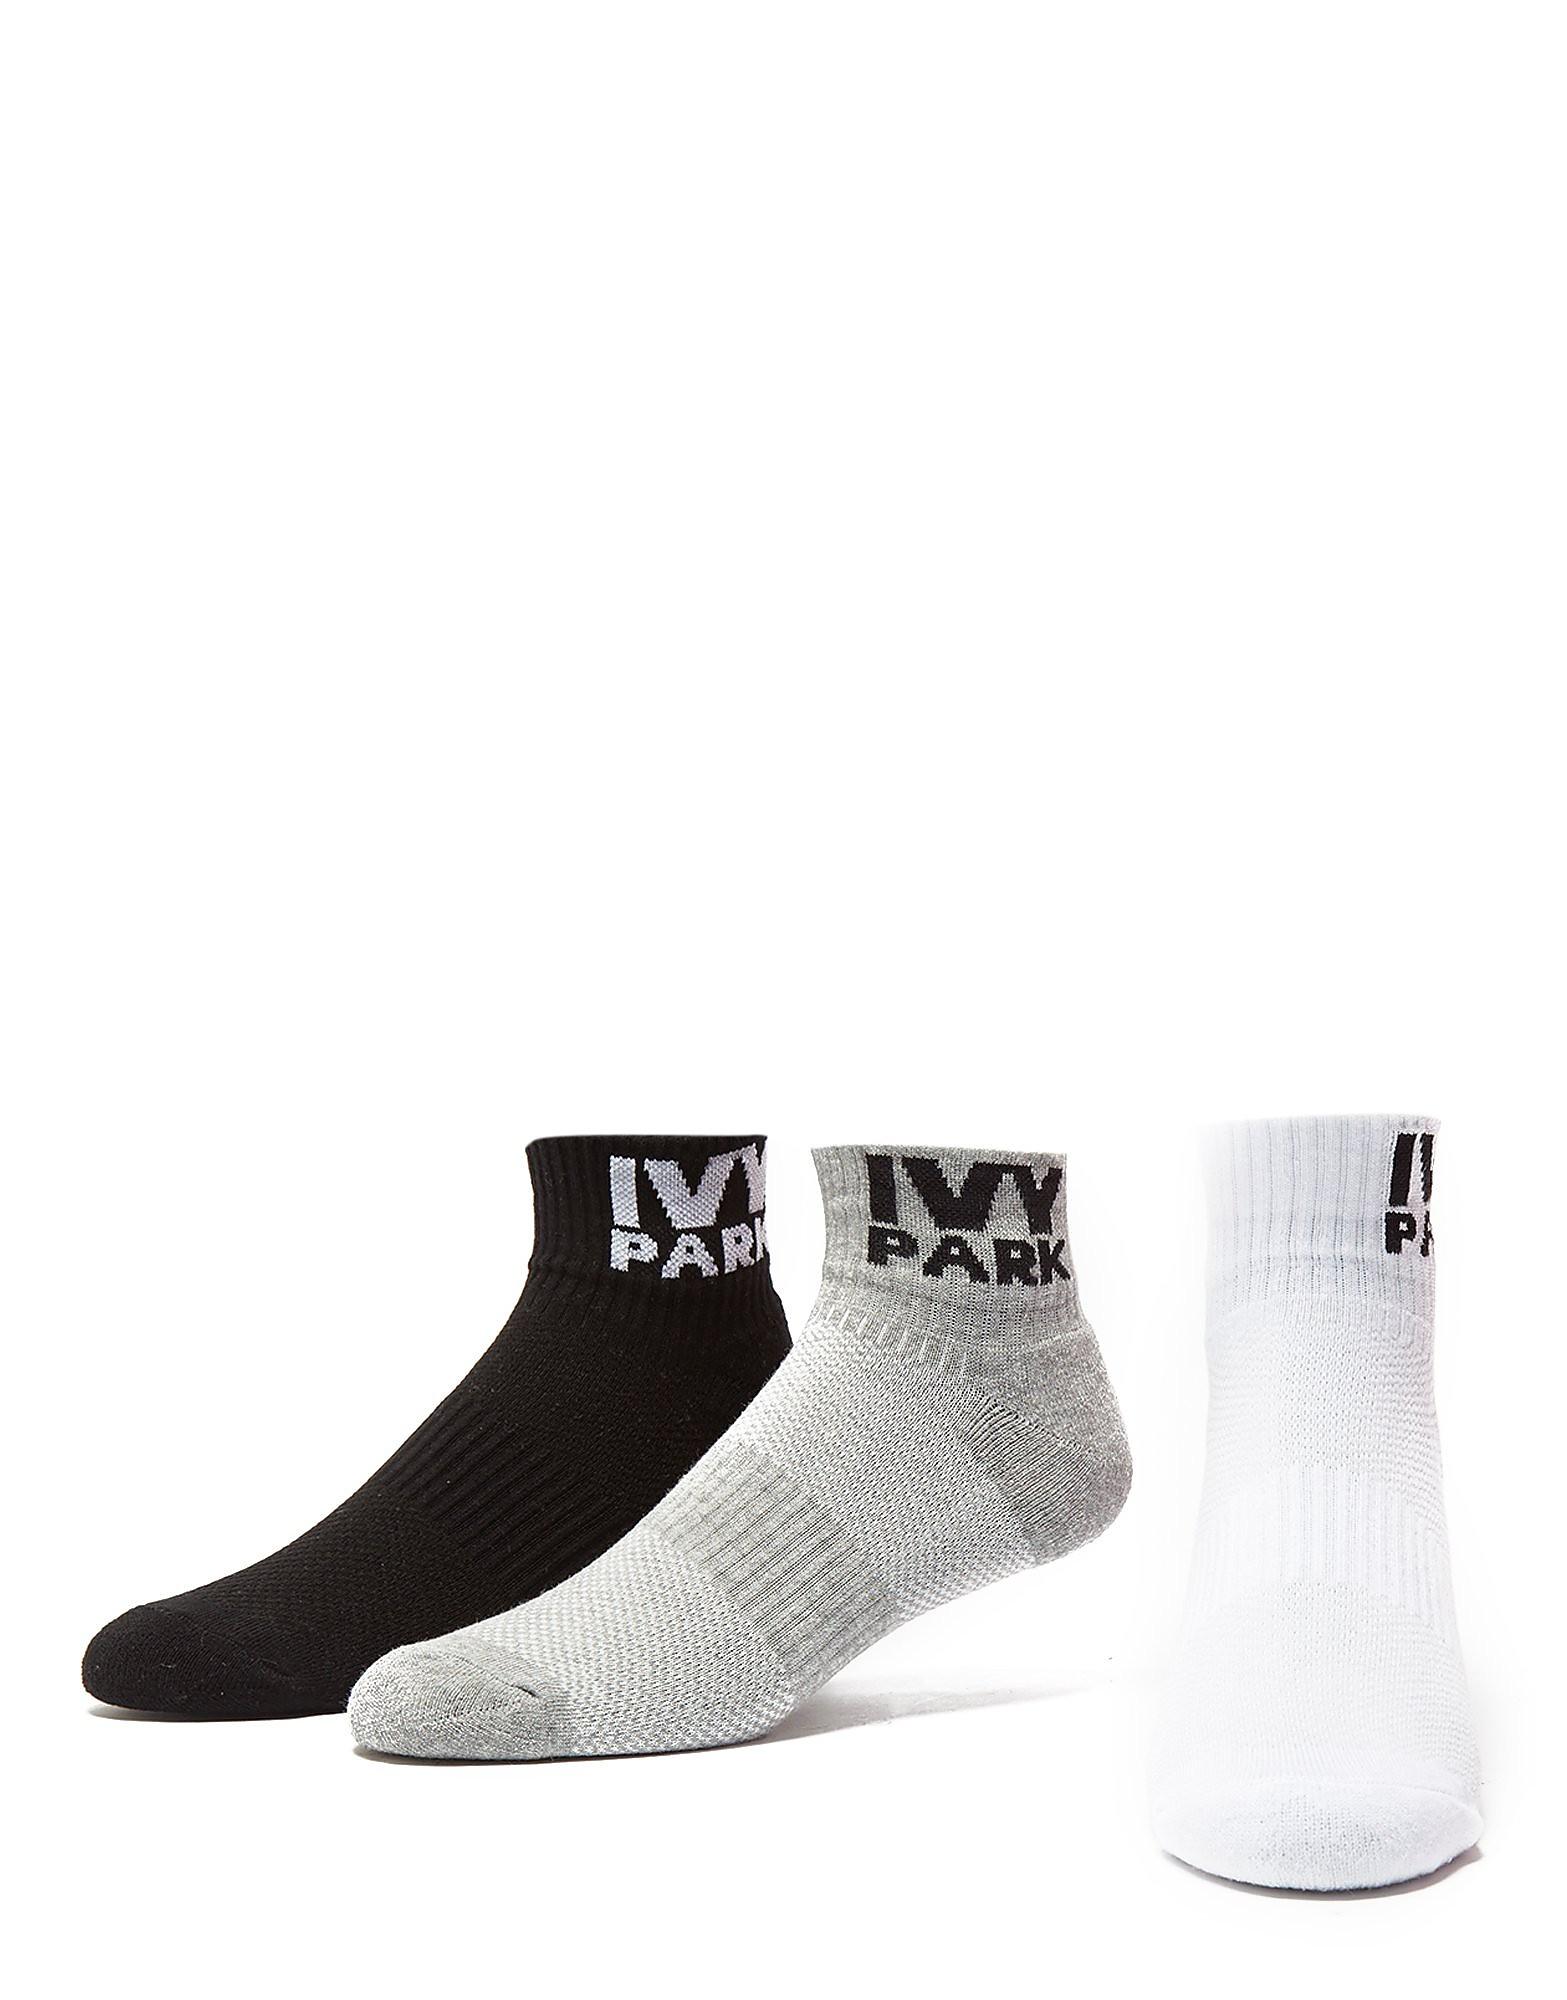 IVY PARK 3 Pack Ankle Socks